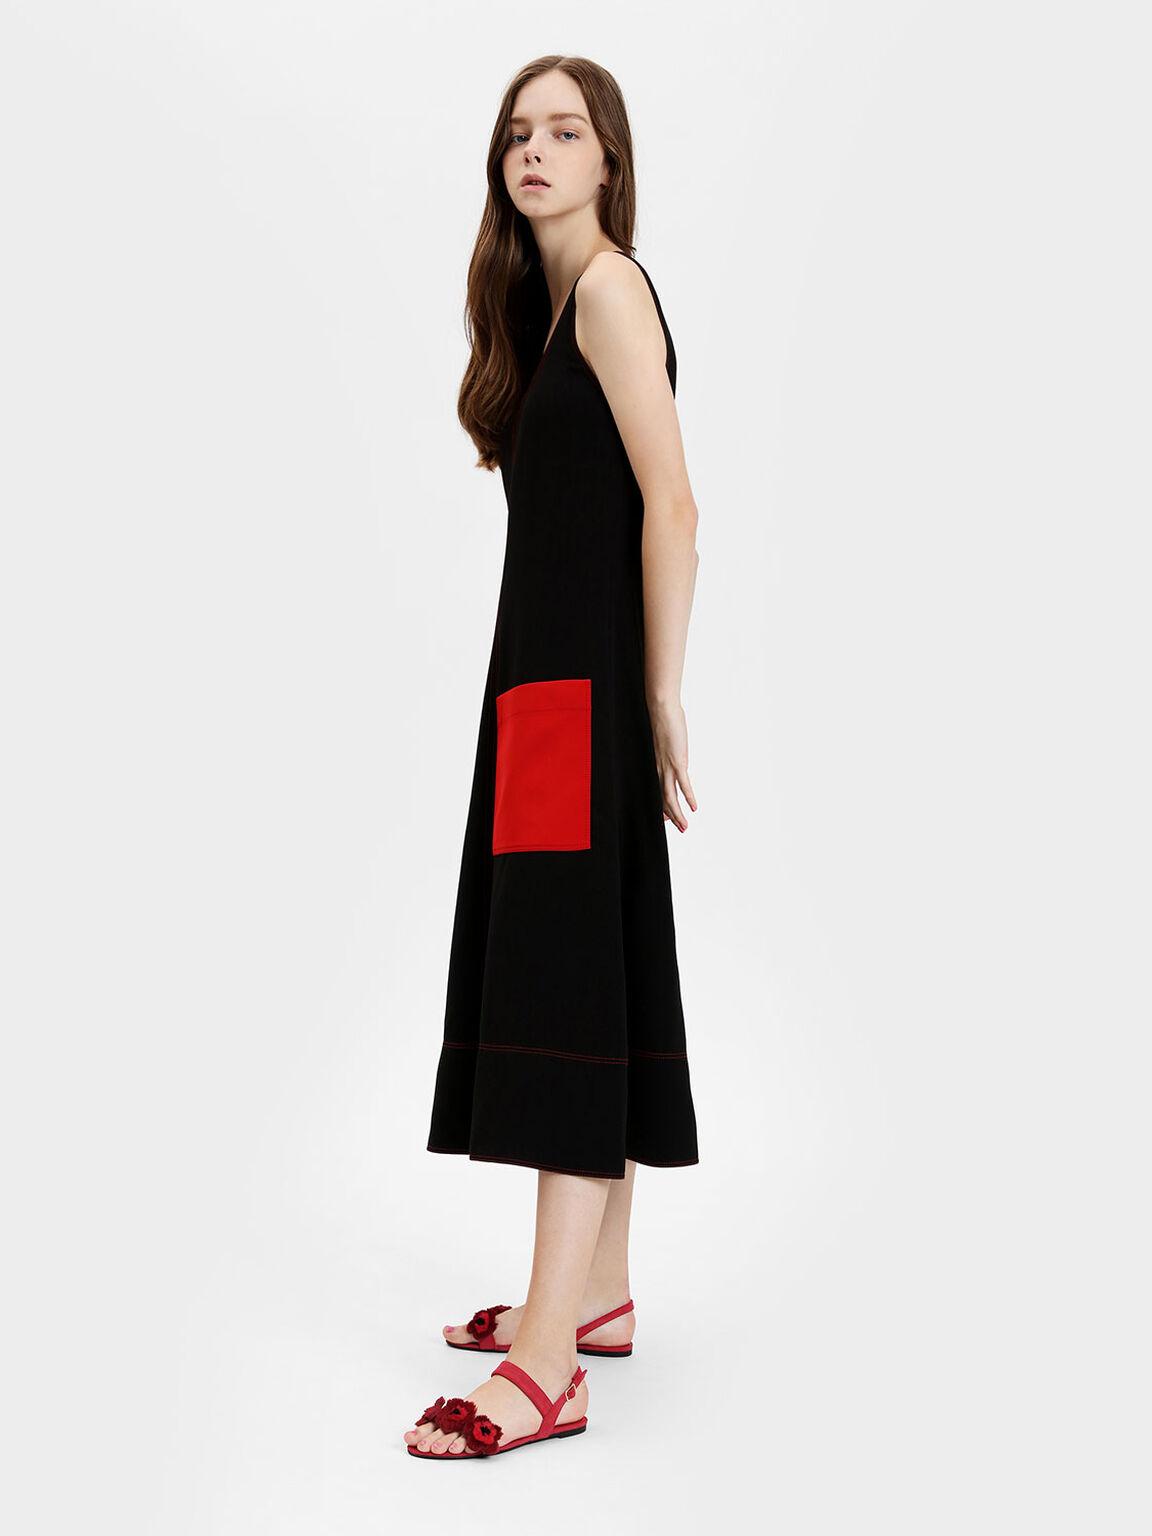 Furry Floral Detail Sandals, Red, hi-res